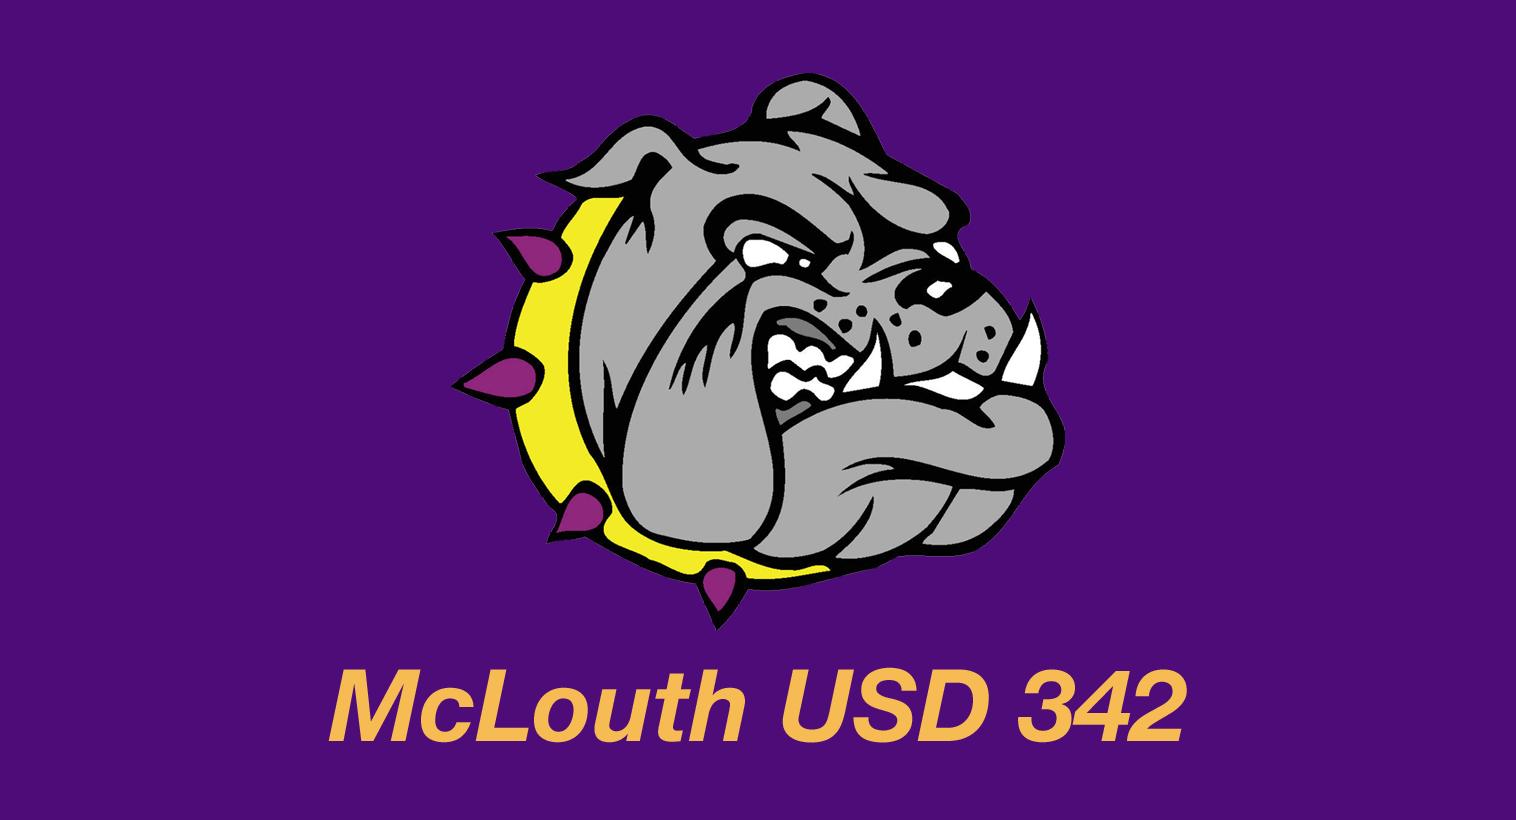 mclouth usd 342